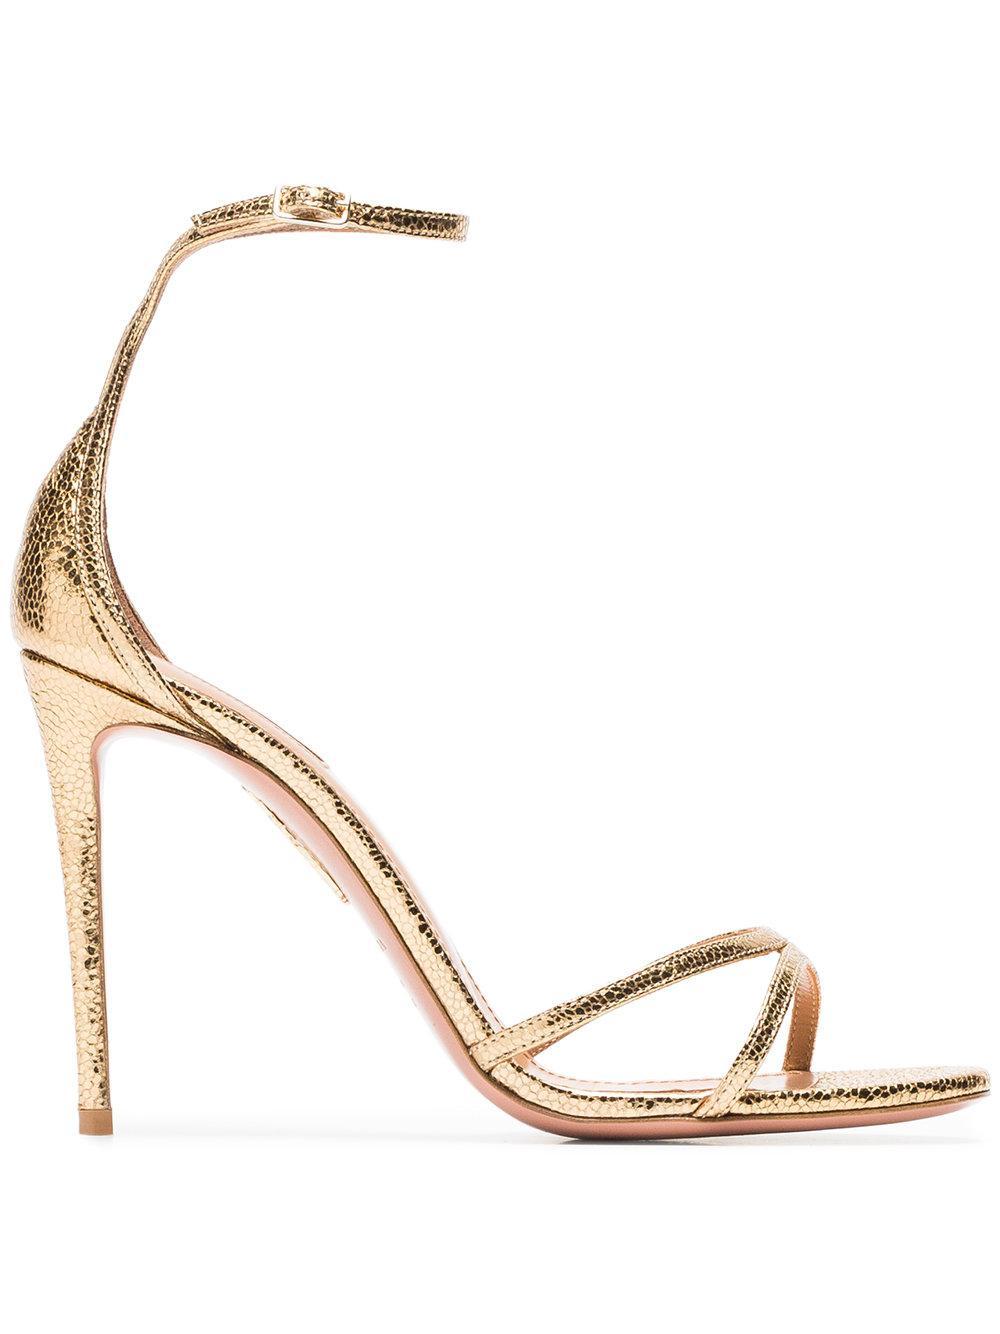 a63889a44 Aquazzura Gold Purist 105 Metallic Leather Sandals